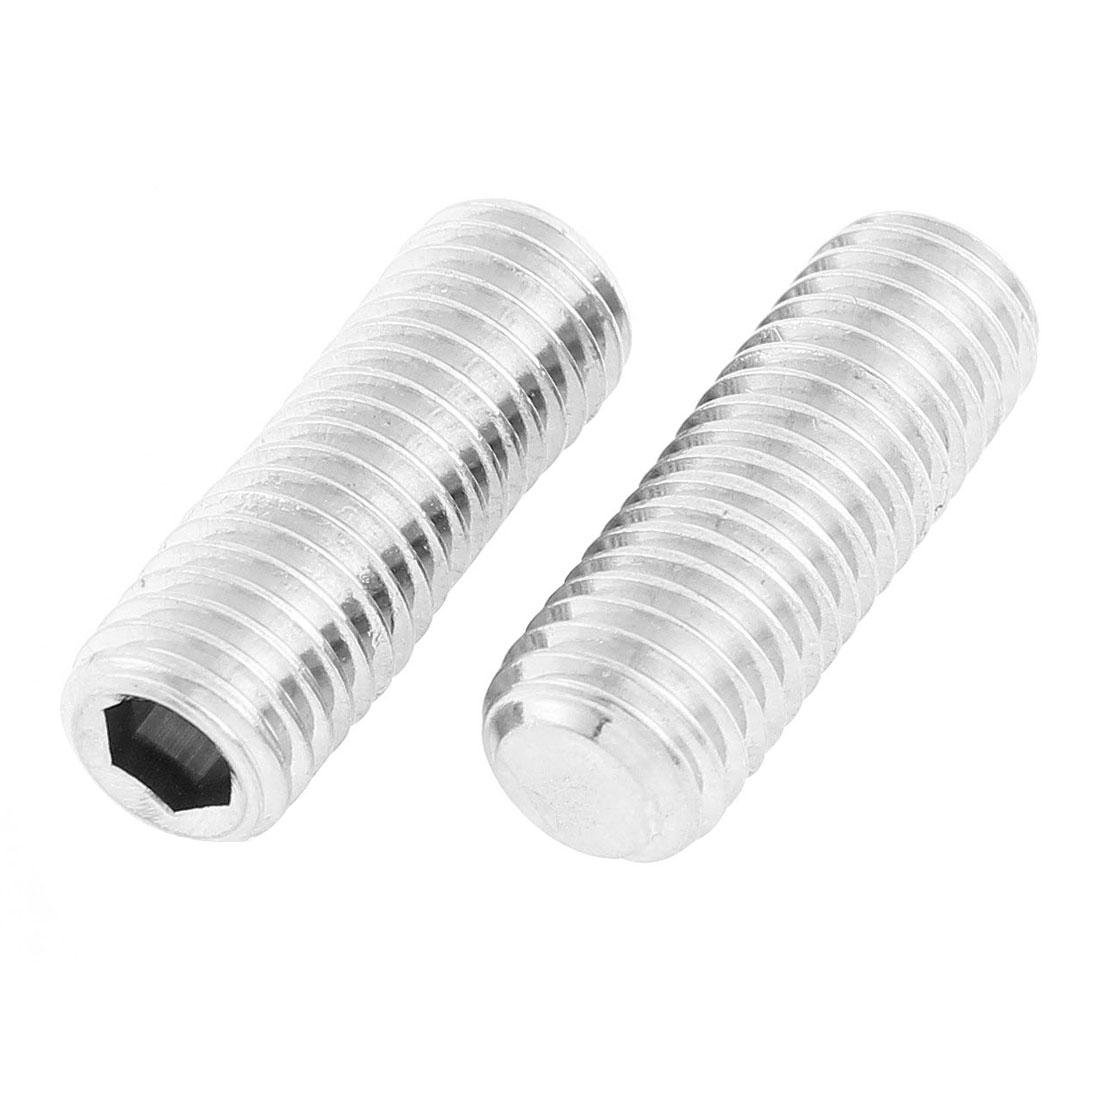 M12x35mm 1.75mm Pitch Stainless Steel Hex Socket Set Flat Point Grub Screws 2pcs